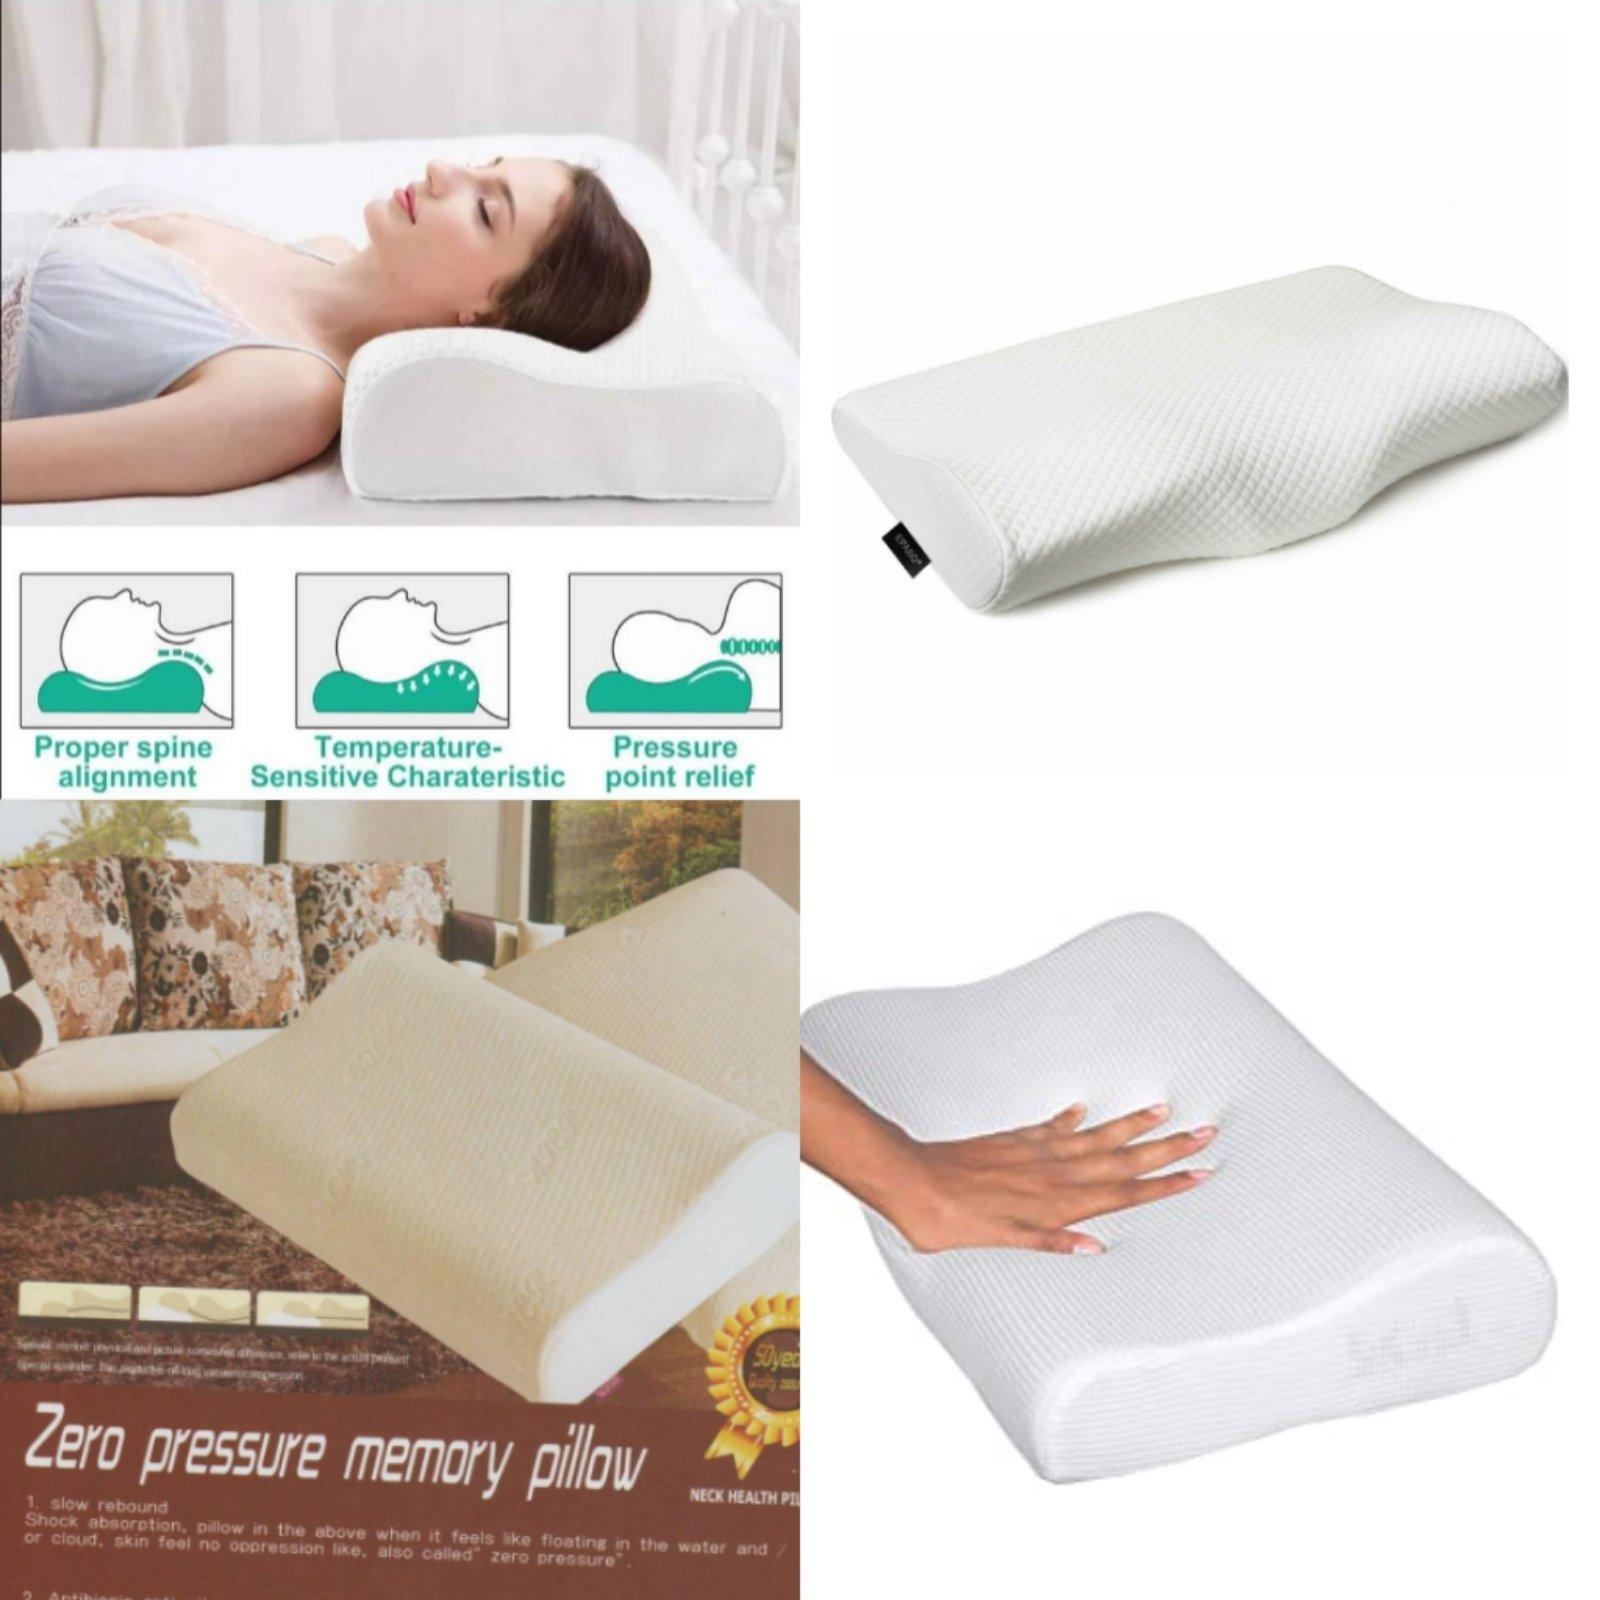 Natural Latex Pillow Sleeping Bedding Cervical Massage Pillow Neck Bonded Care Anti-Snoring Memory Pillow, Zero Gravity Memory Pillow